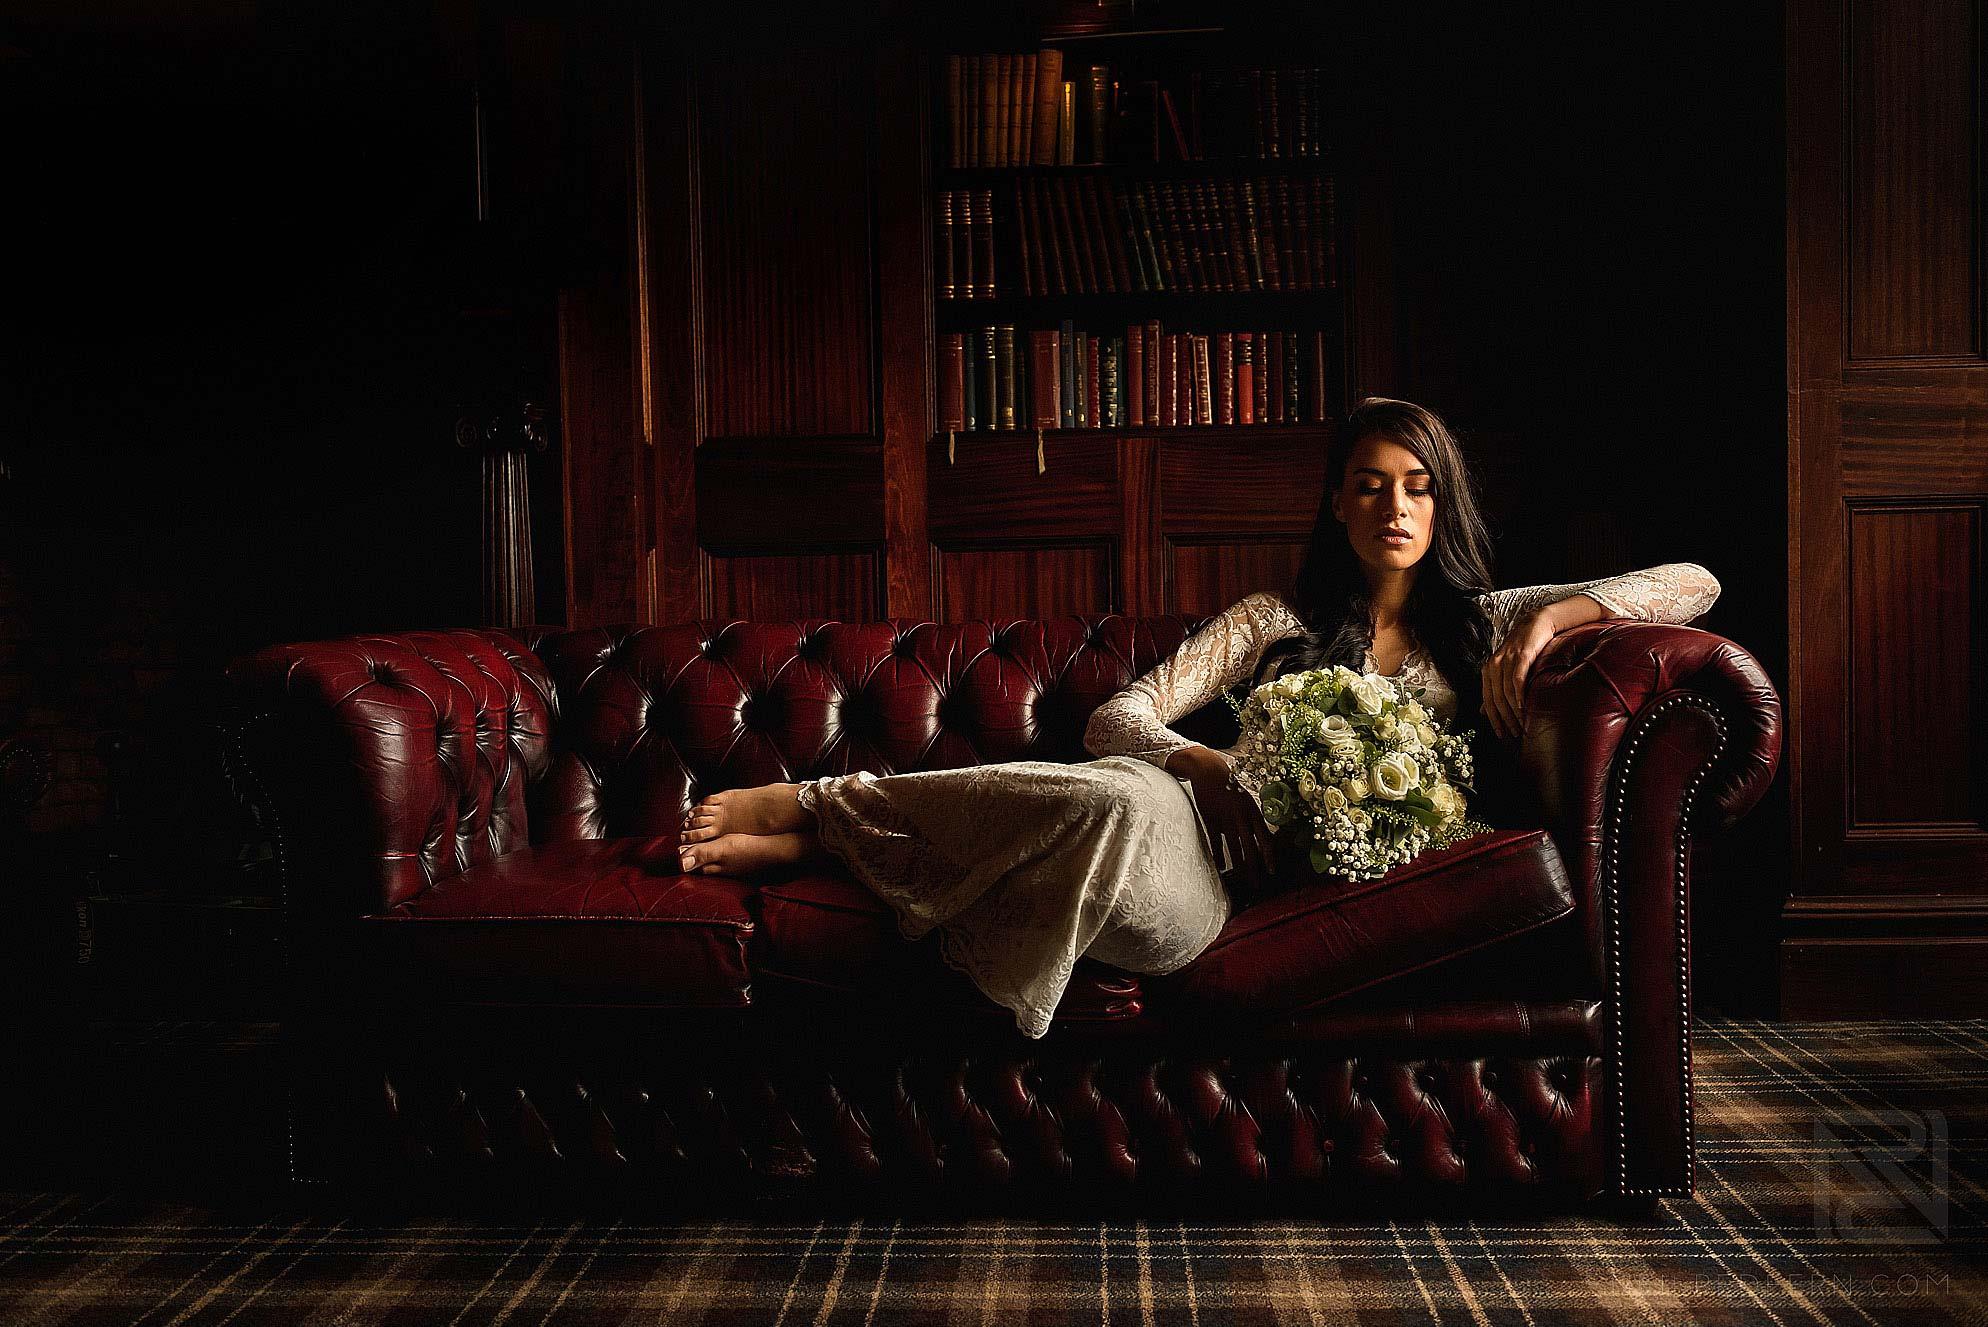 manchester-wedding-photography-workshop-02